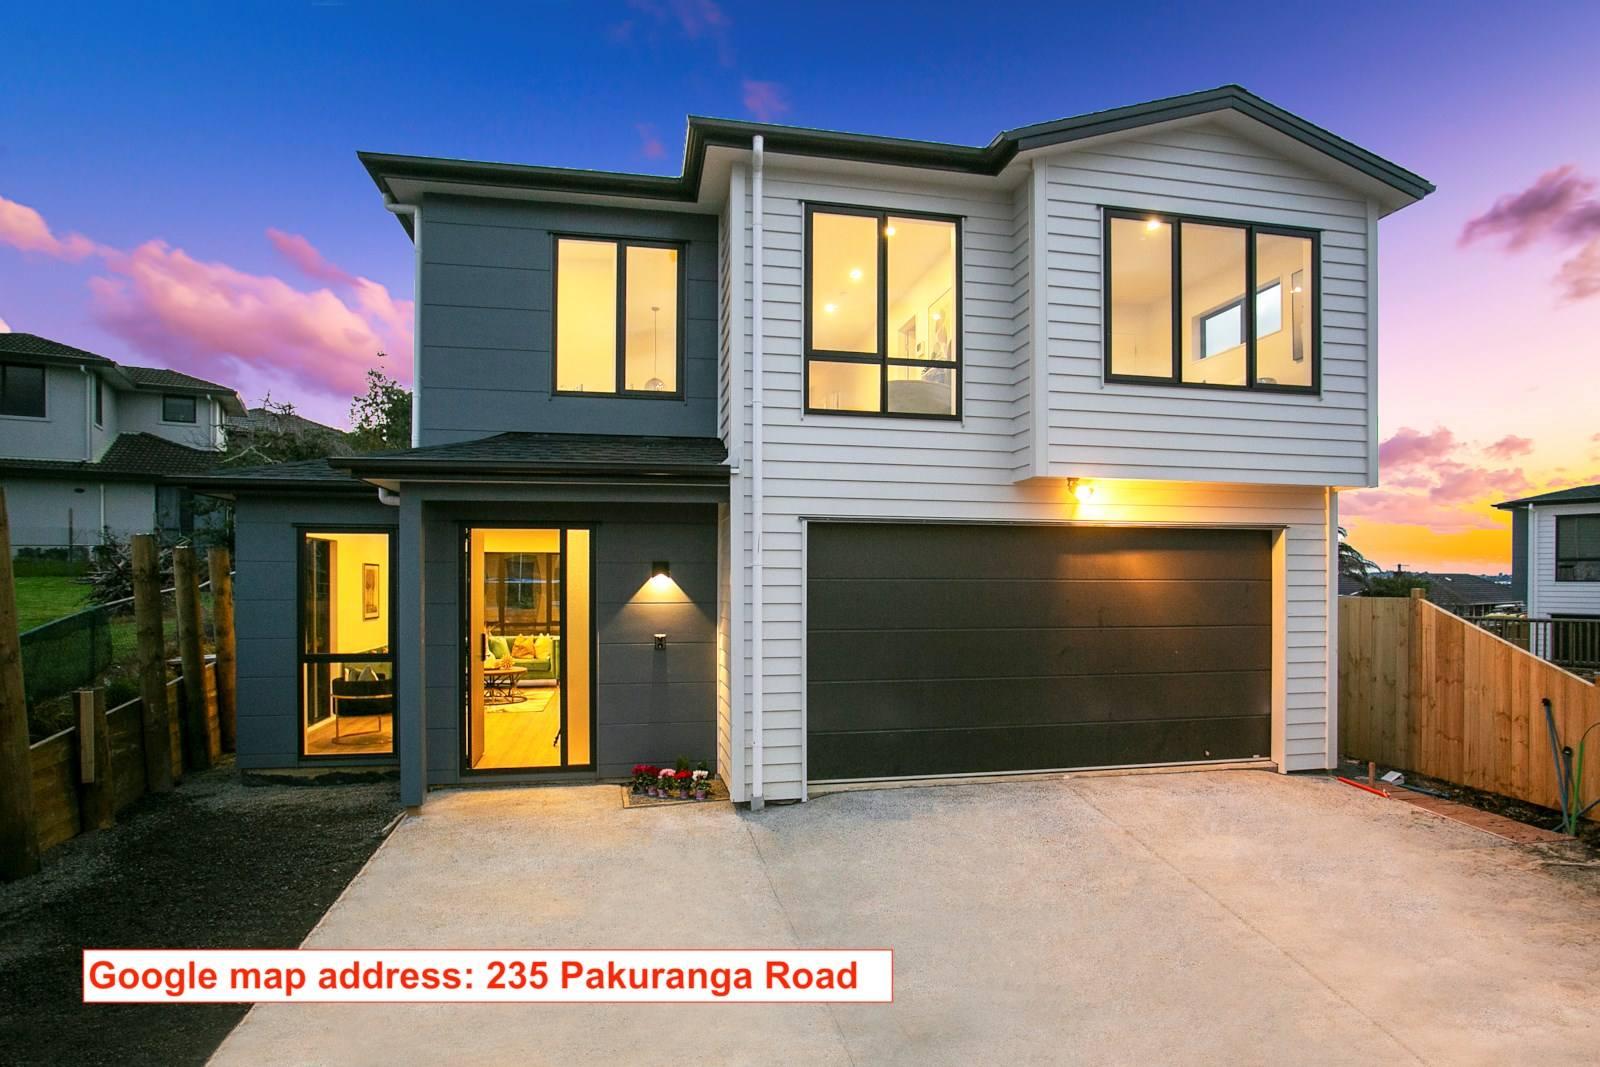 Pakuranga 4房 全新意式奢居 可自选装潢/配色方案 10年质保 预计2020年4月竣工! Brand New Start !!